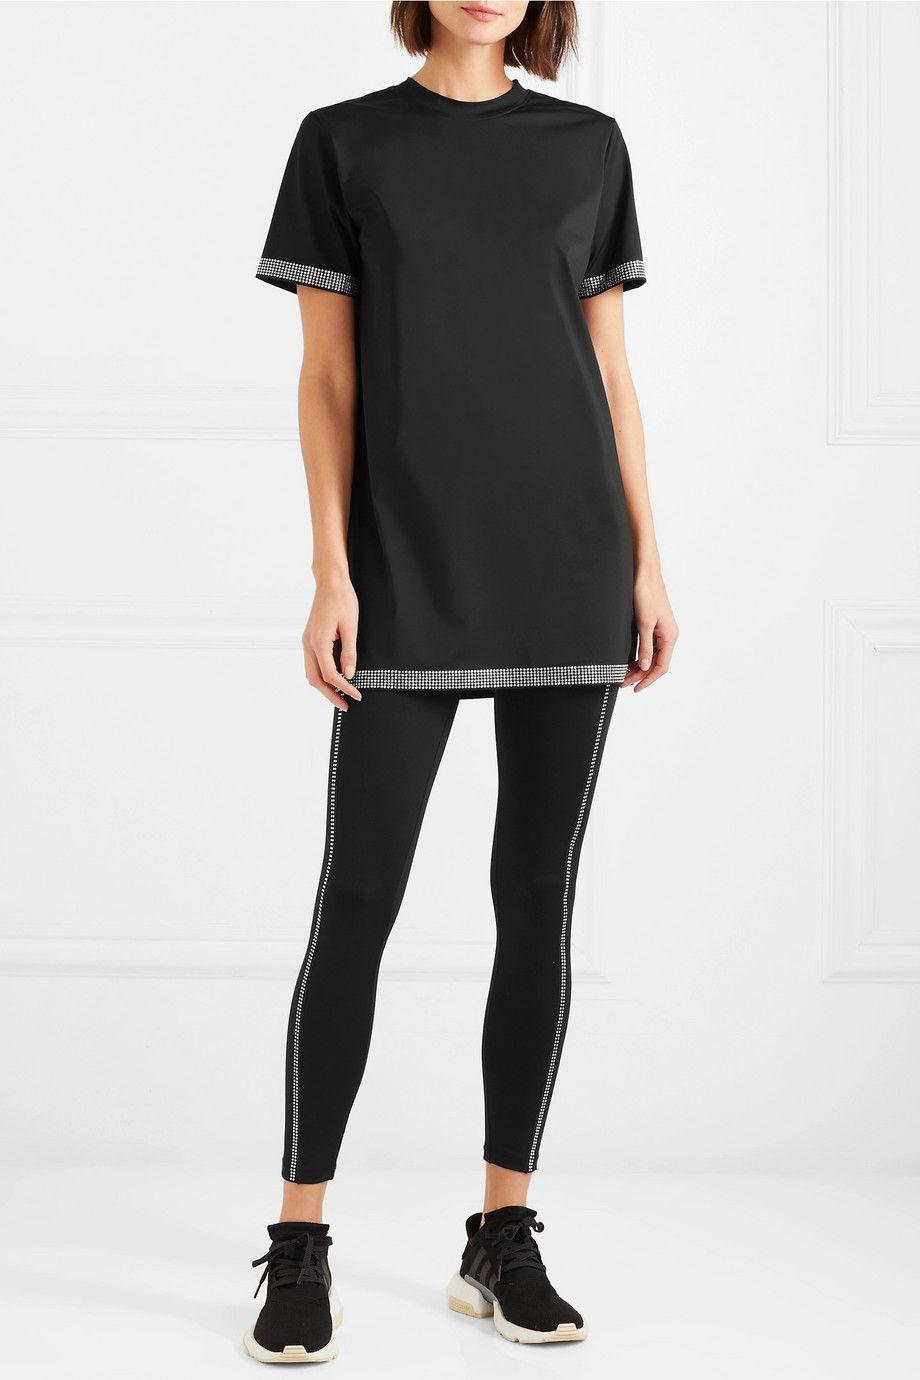 Adam Selman Sport Crystalembellished stretch mini dress